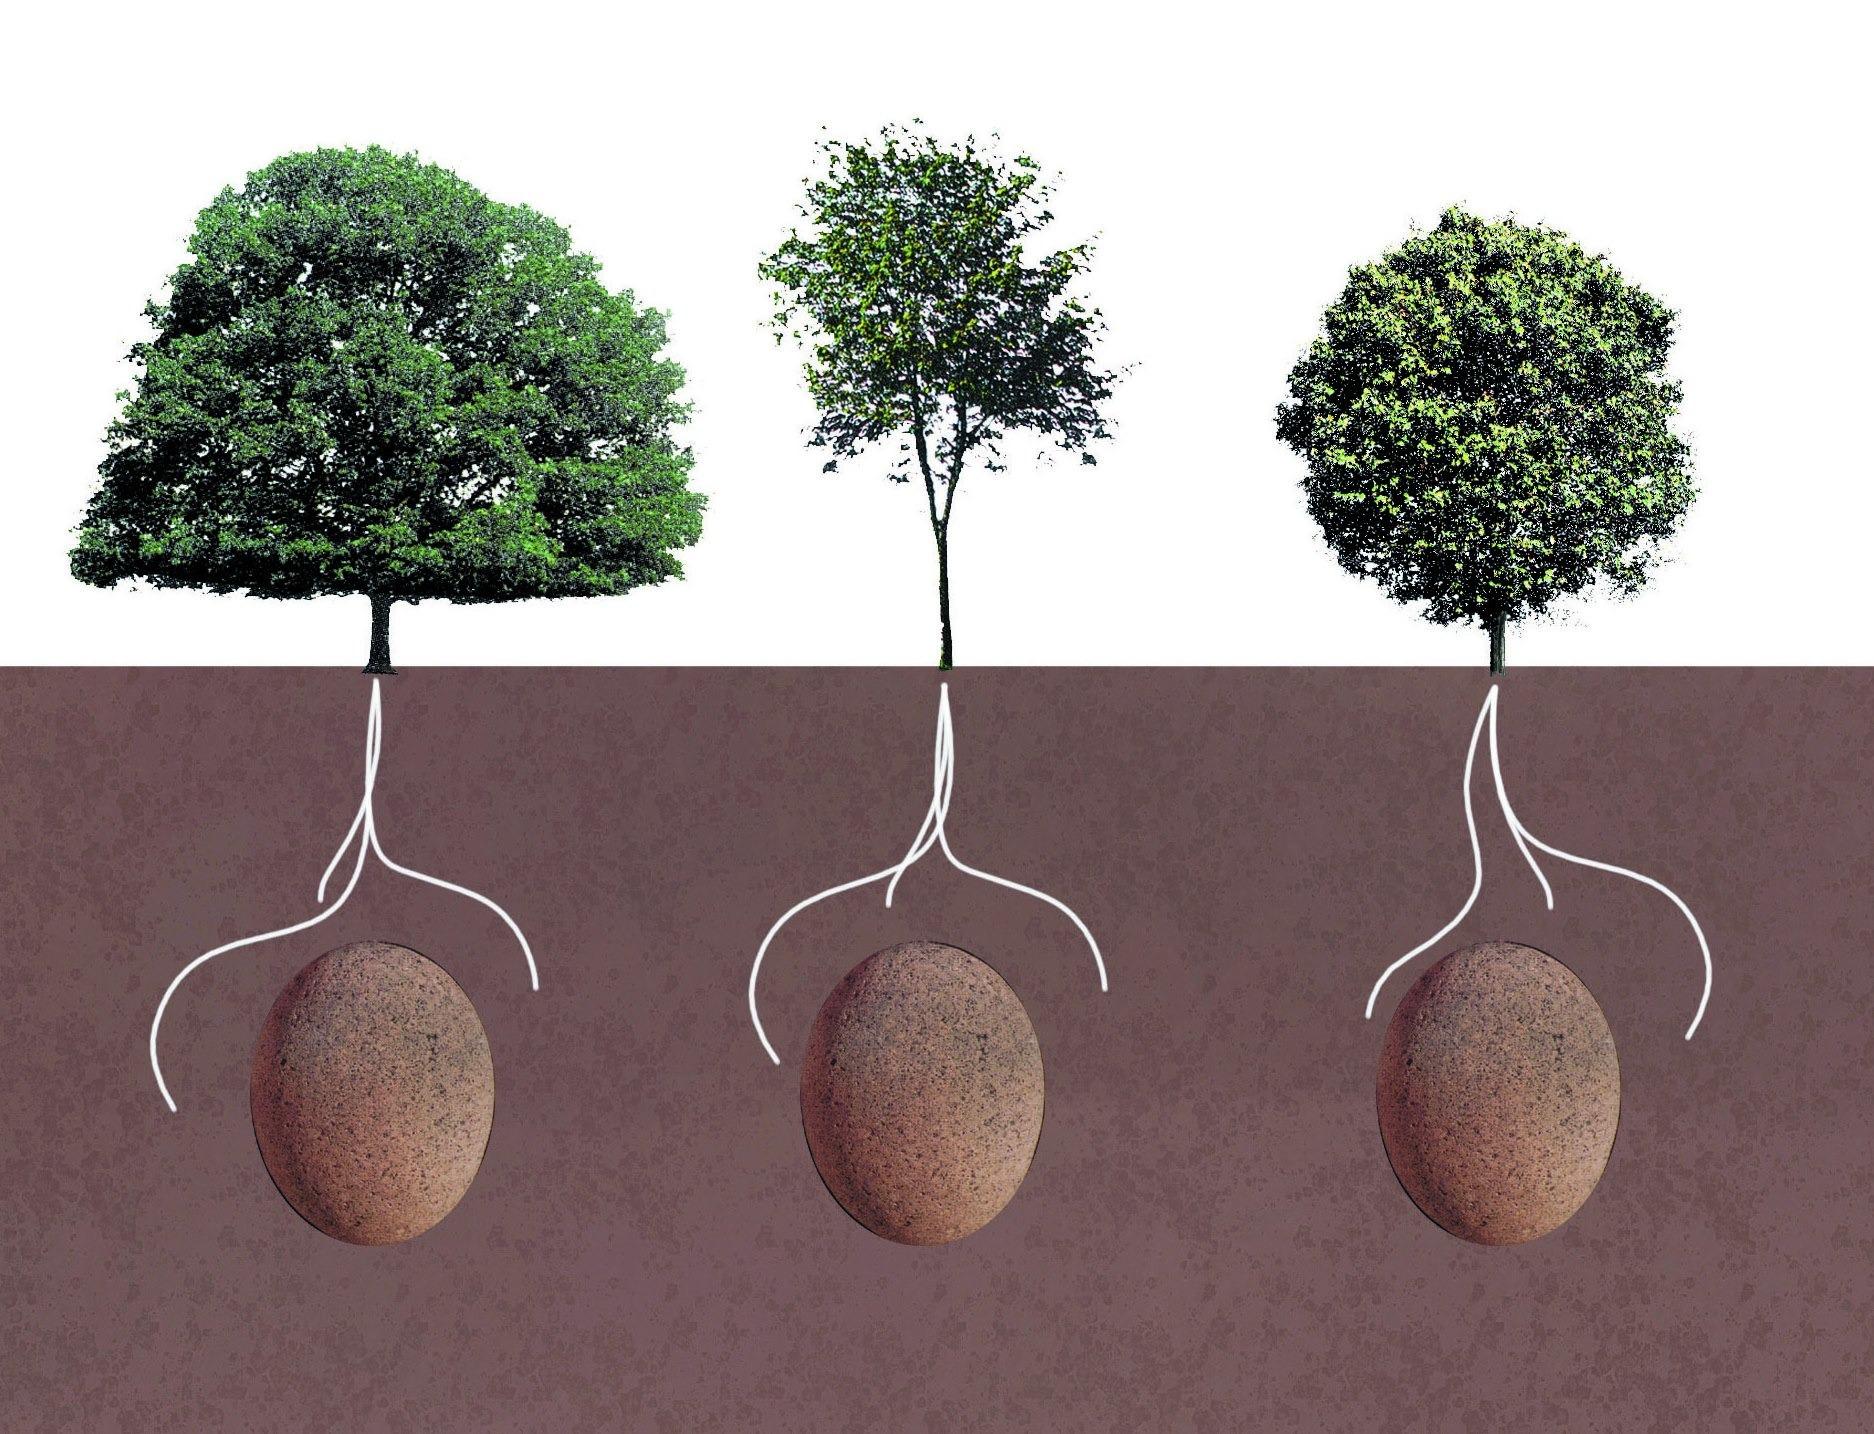 biodegradable burial pod